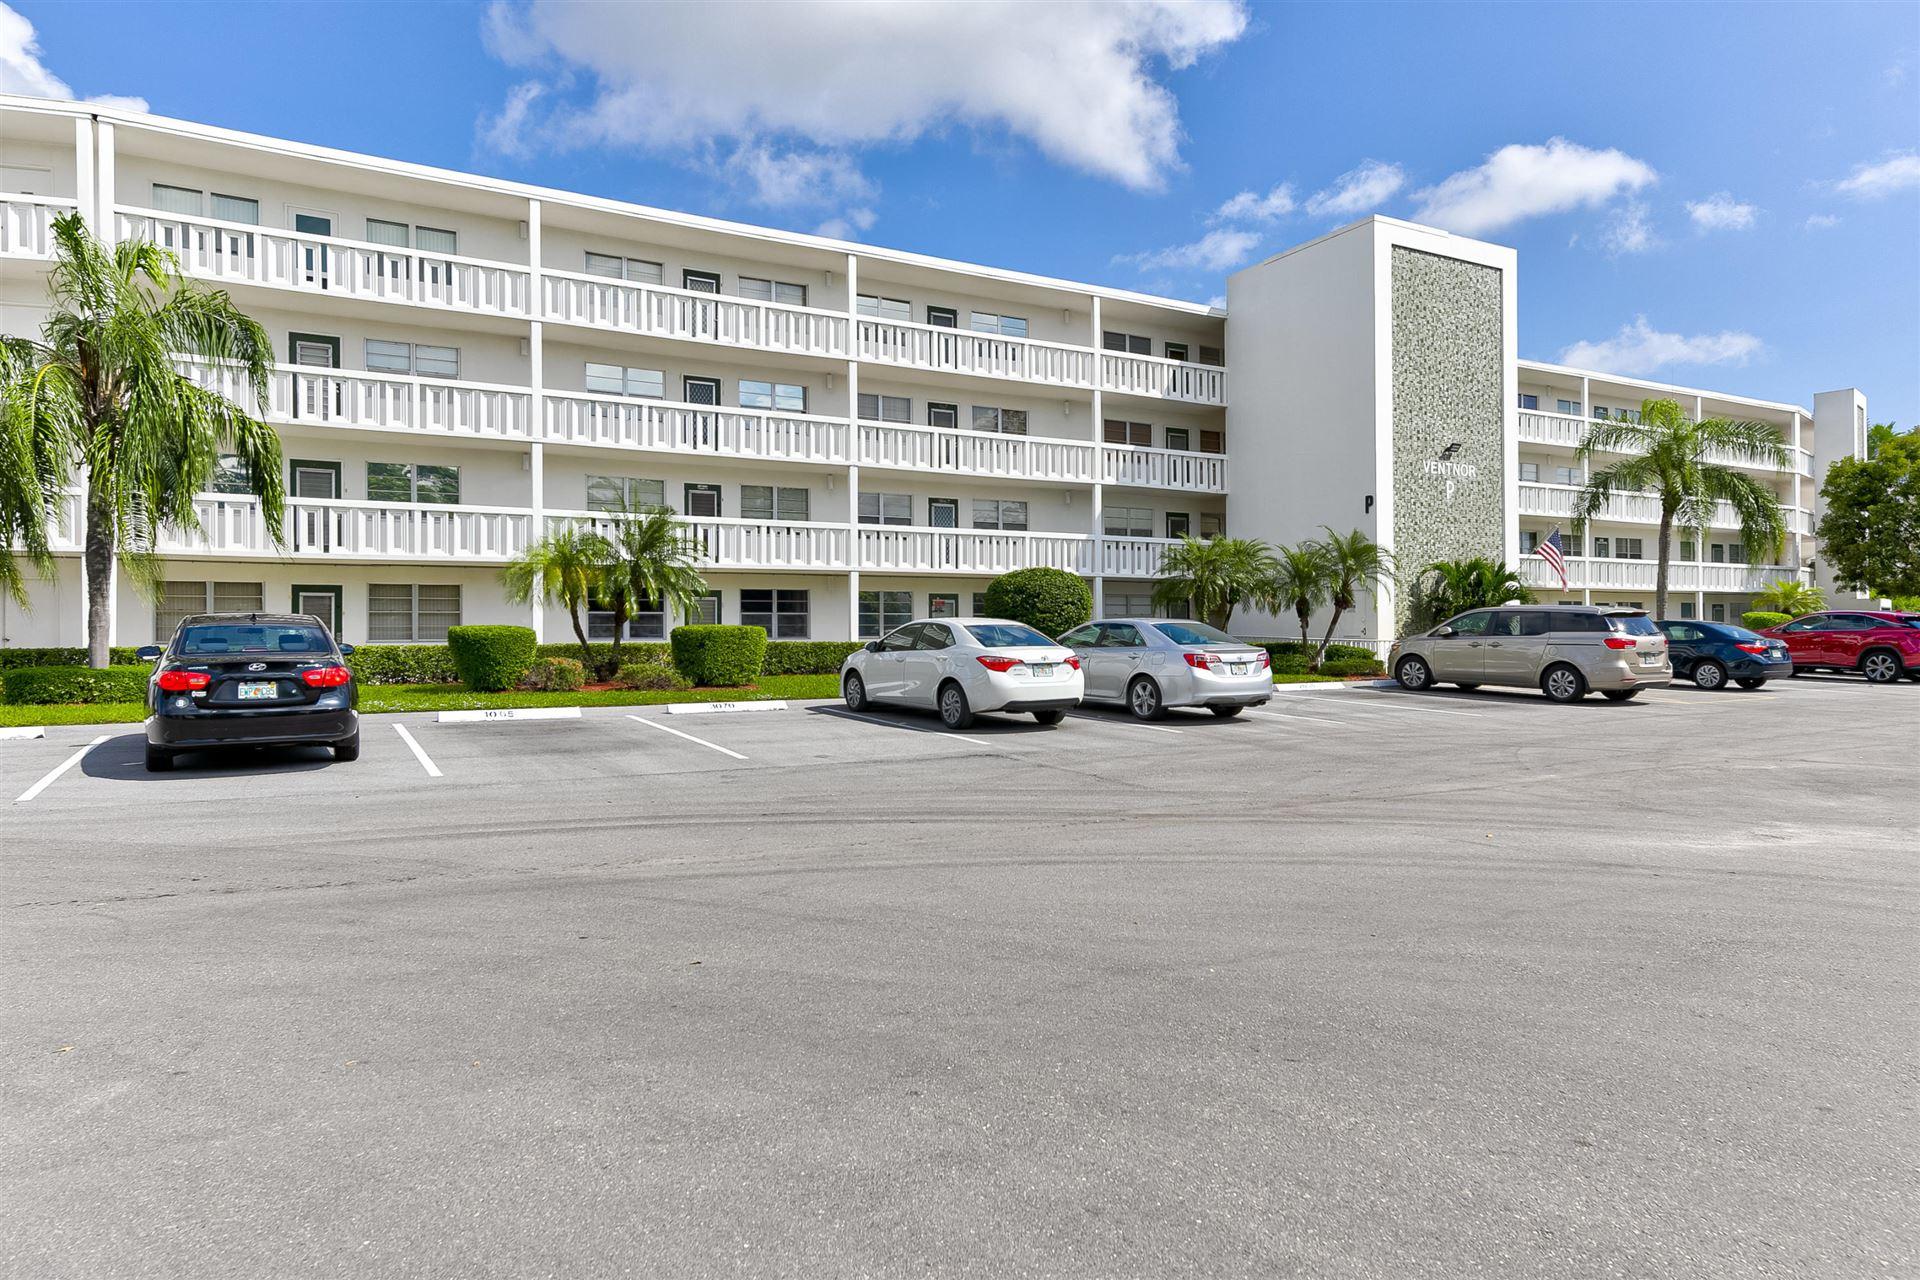 4063 Ventnor P, Deerfield Beach, FL 33442 - MLS#: RX-10721650